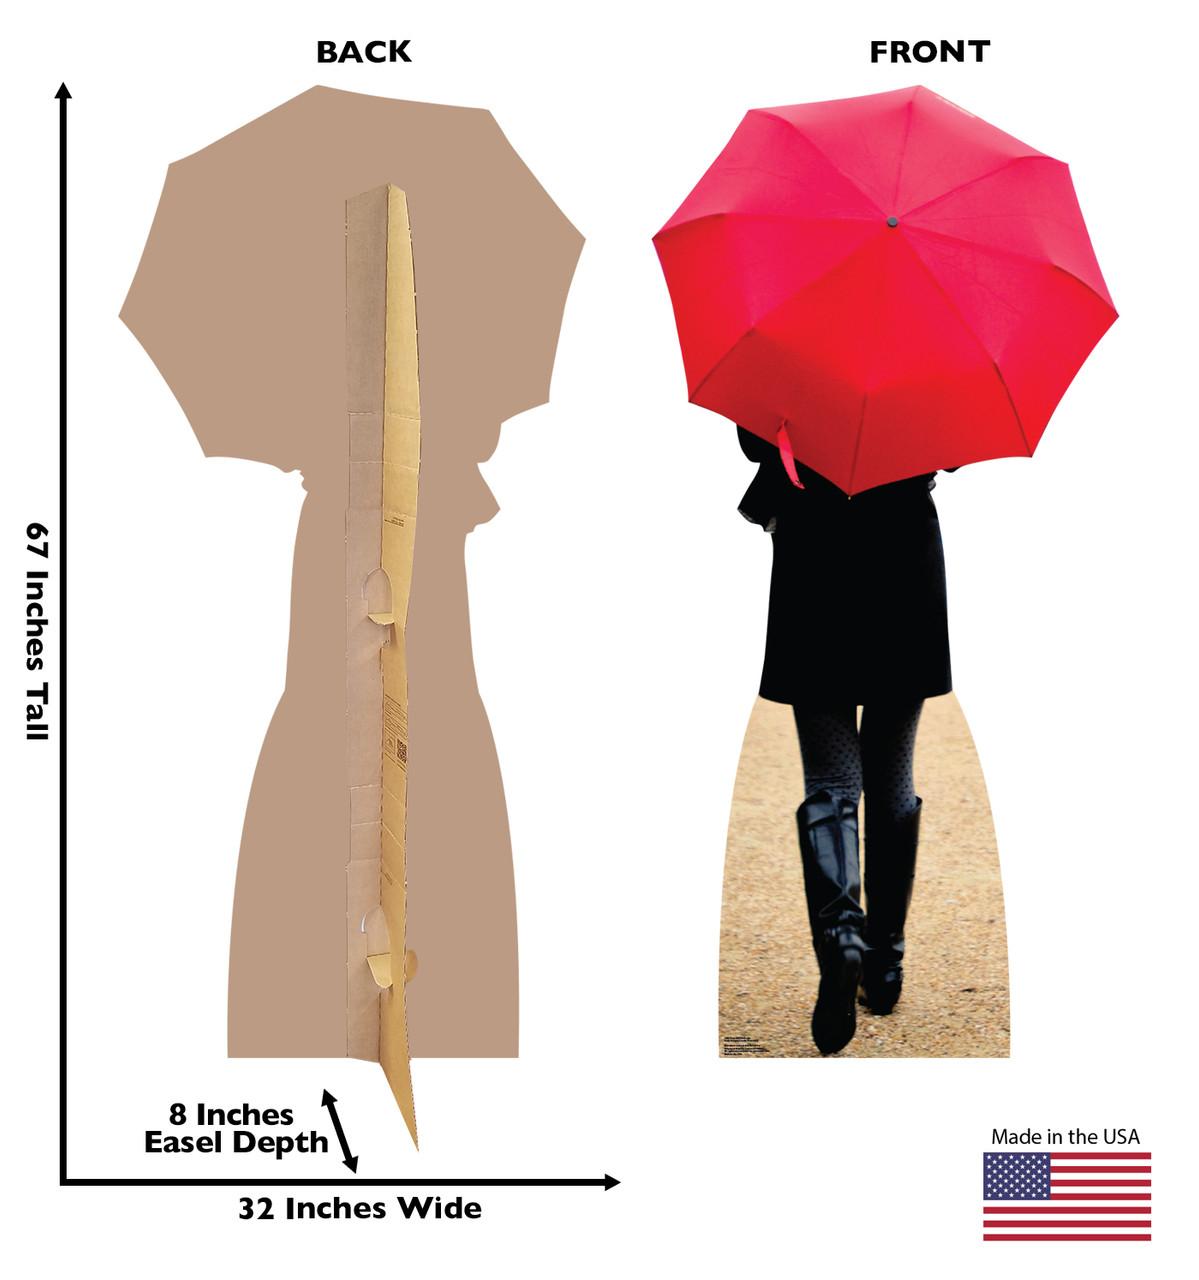 Life-size Paris Red Umbrella Cardboard Standup | Cardboard Cutout